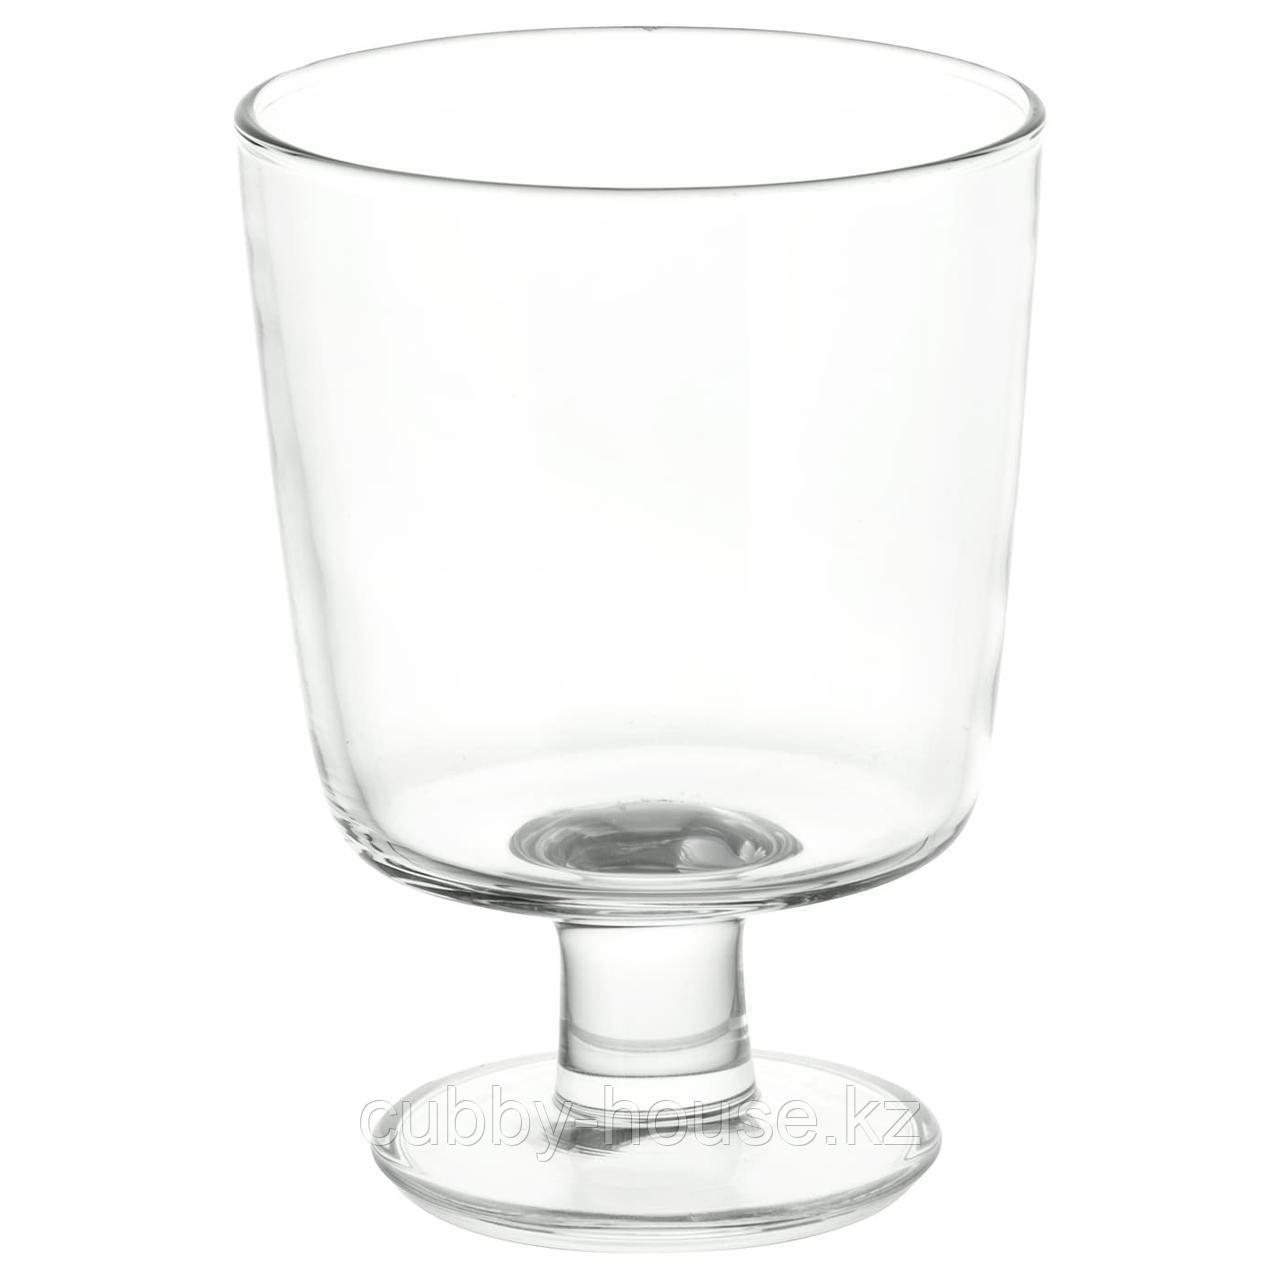 ИКЕА/365+ Бокал, прозрачное стекло, 30 сл